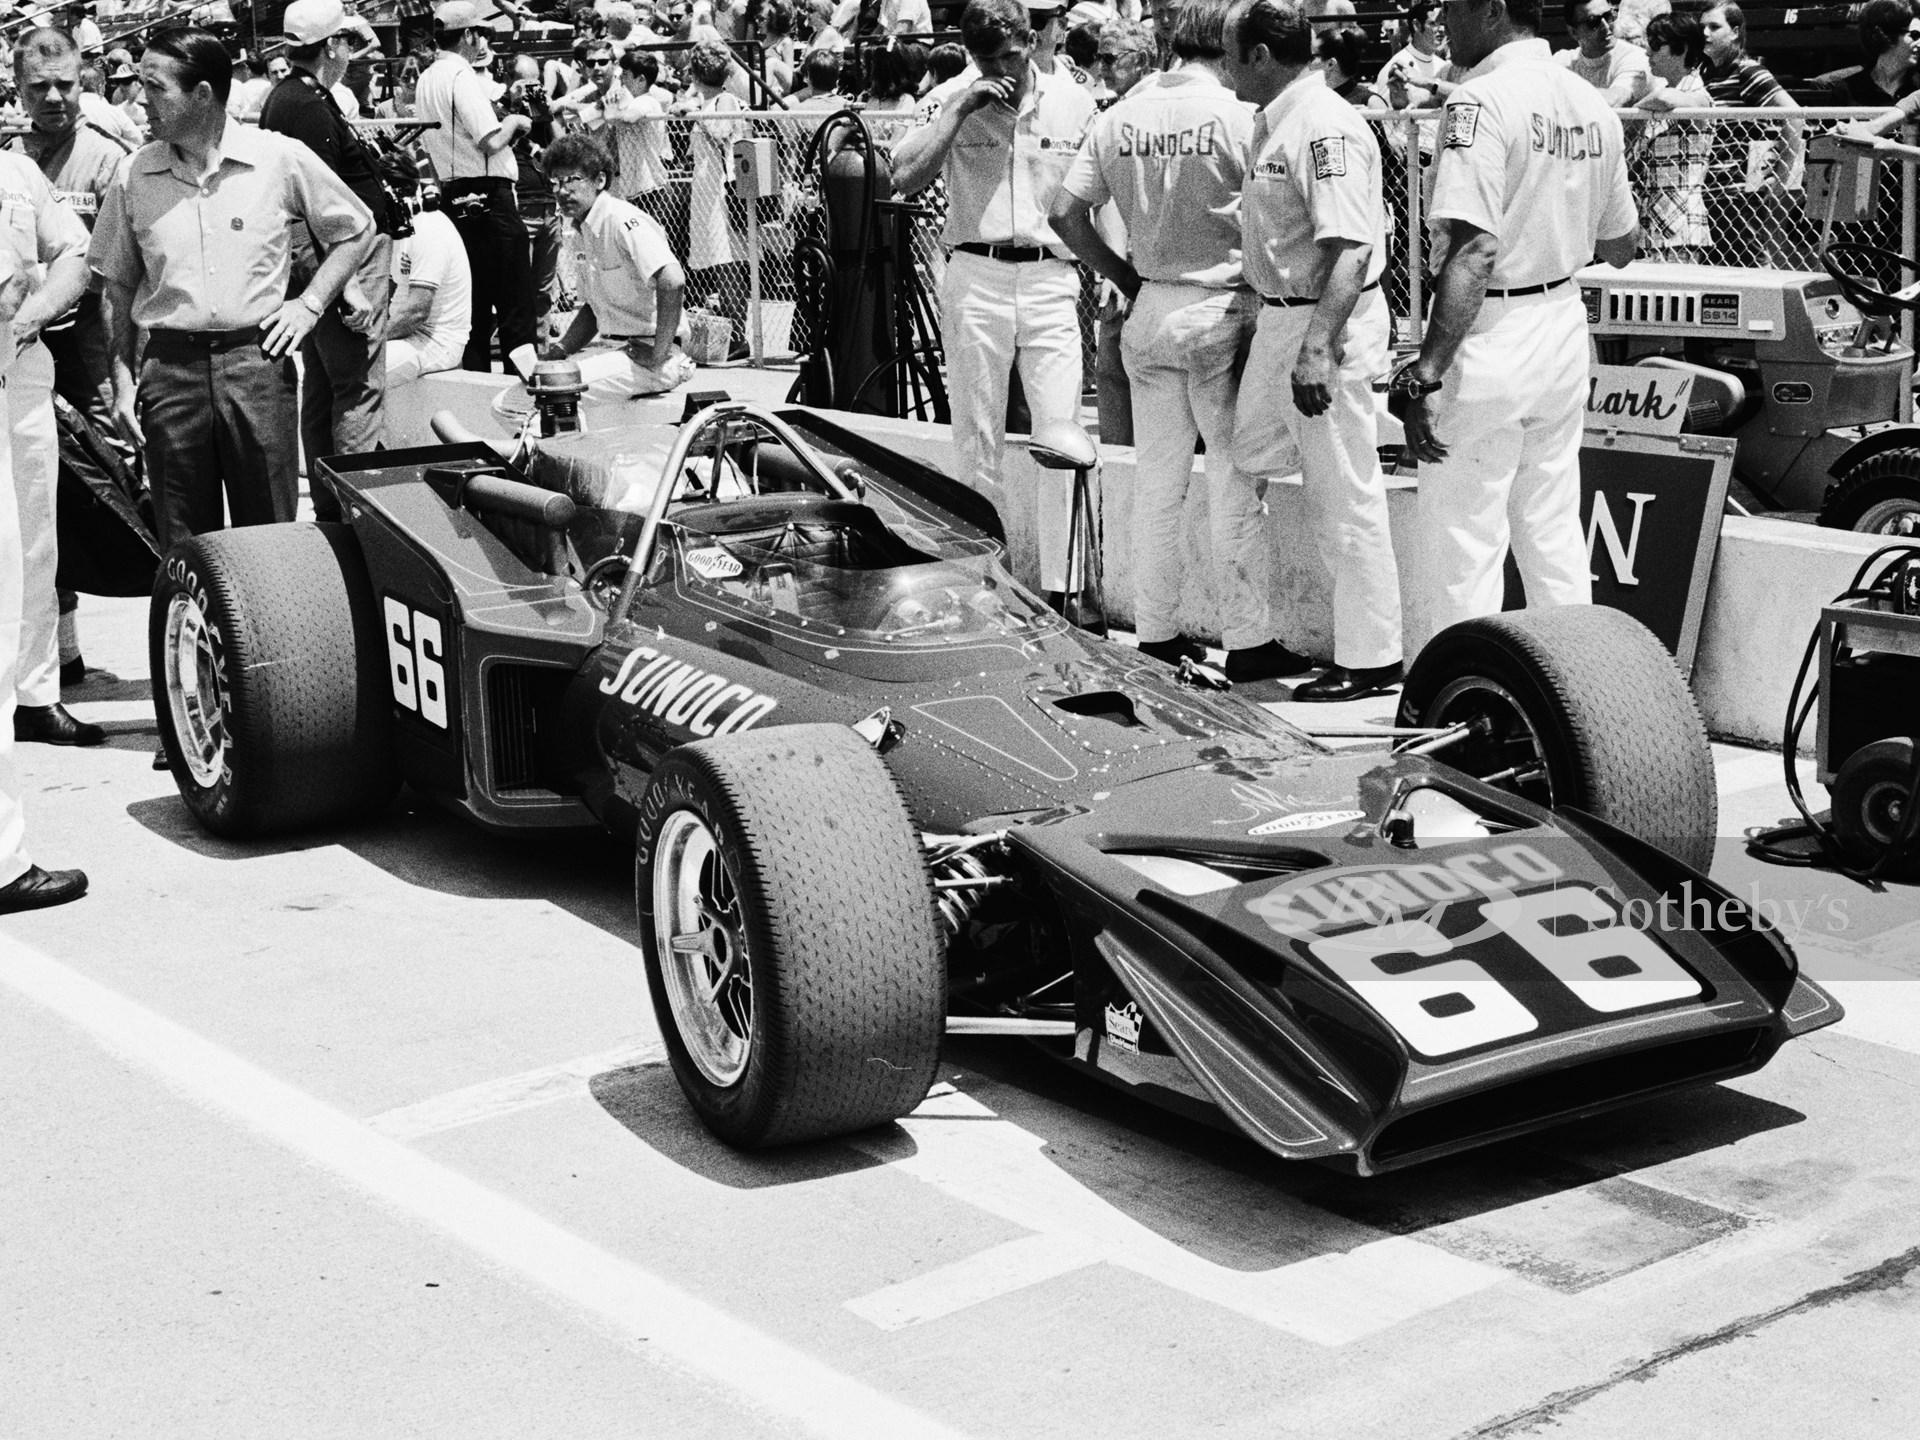 1970 Lola T153 'Sunoco Special'